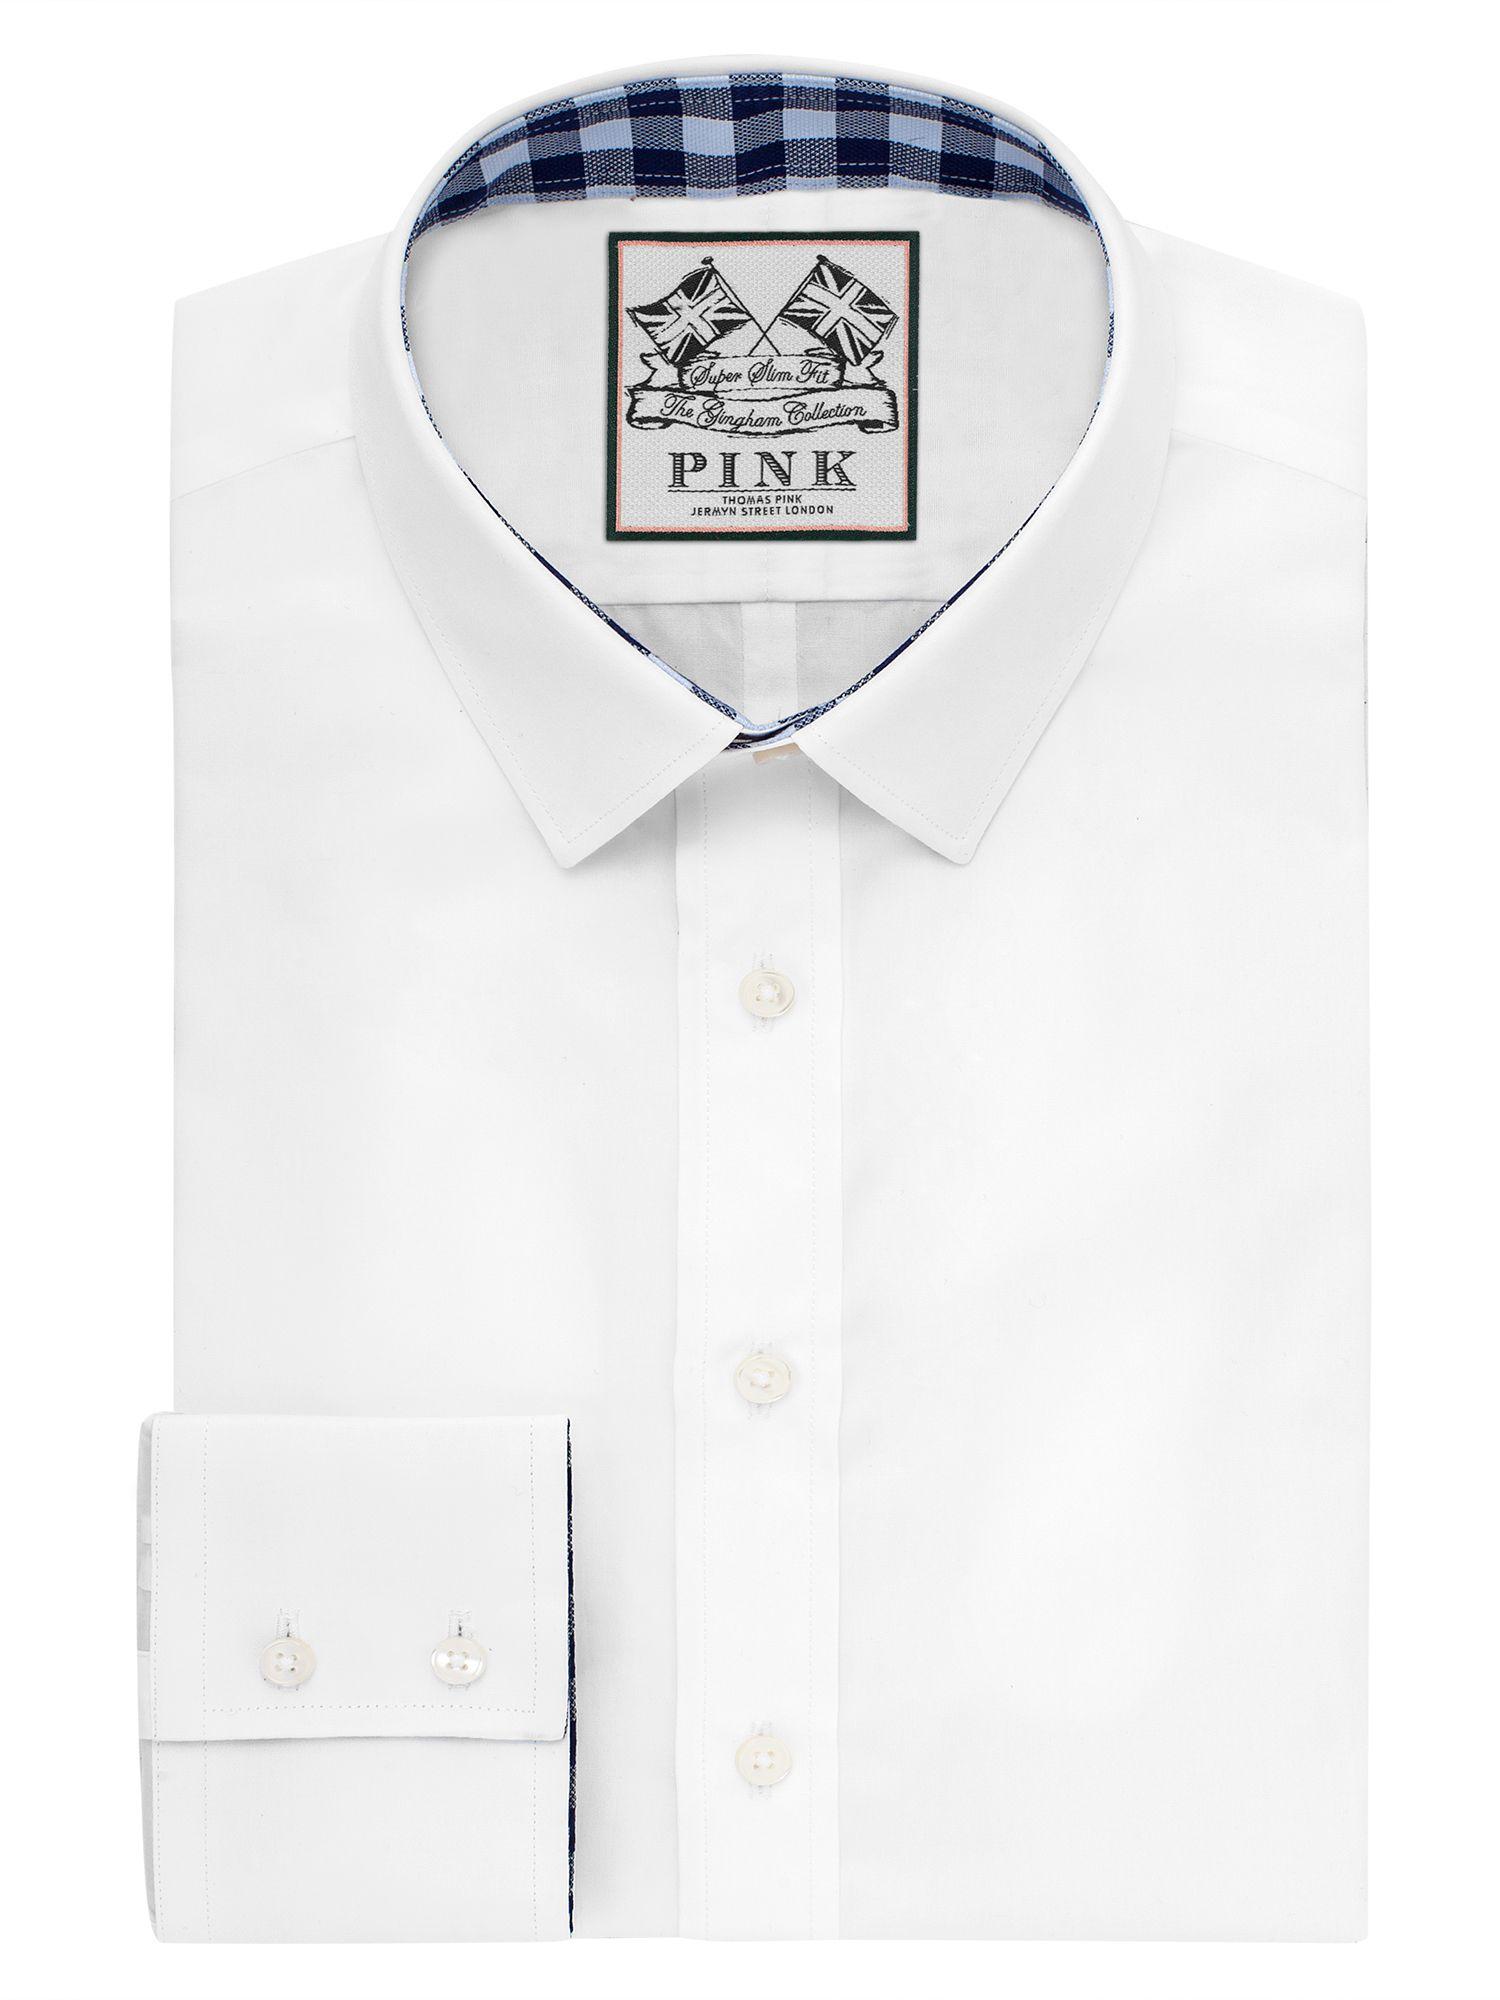 Lyst - Thomas pink Plato Plain Super Slim Fit Shirt in White for Men